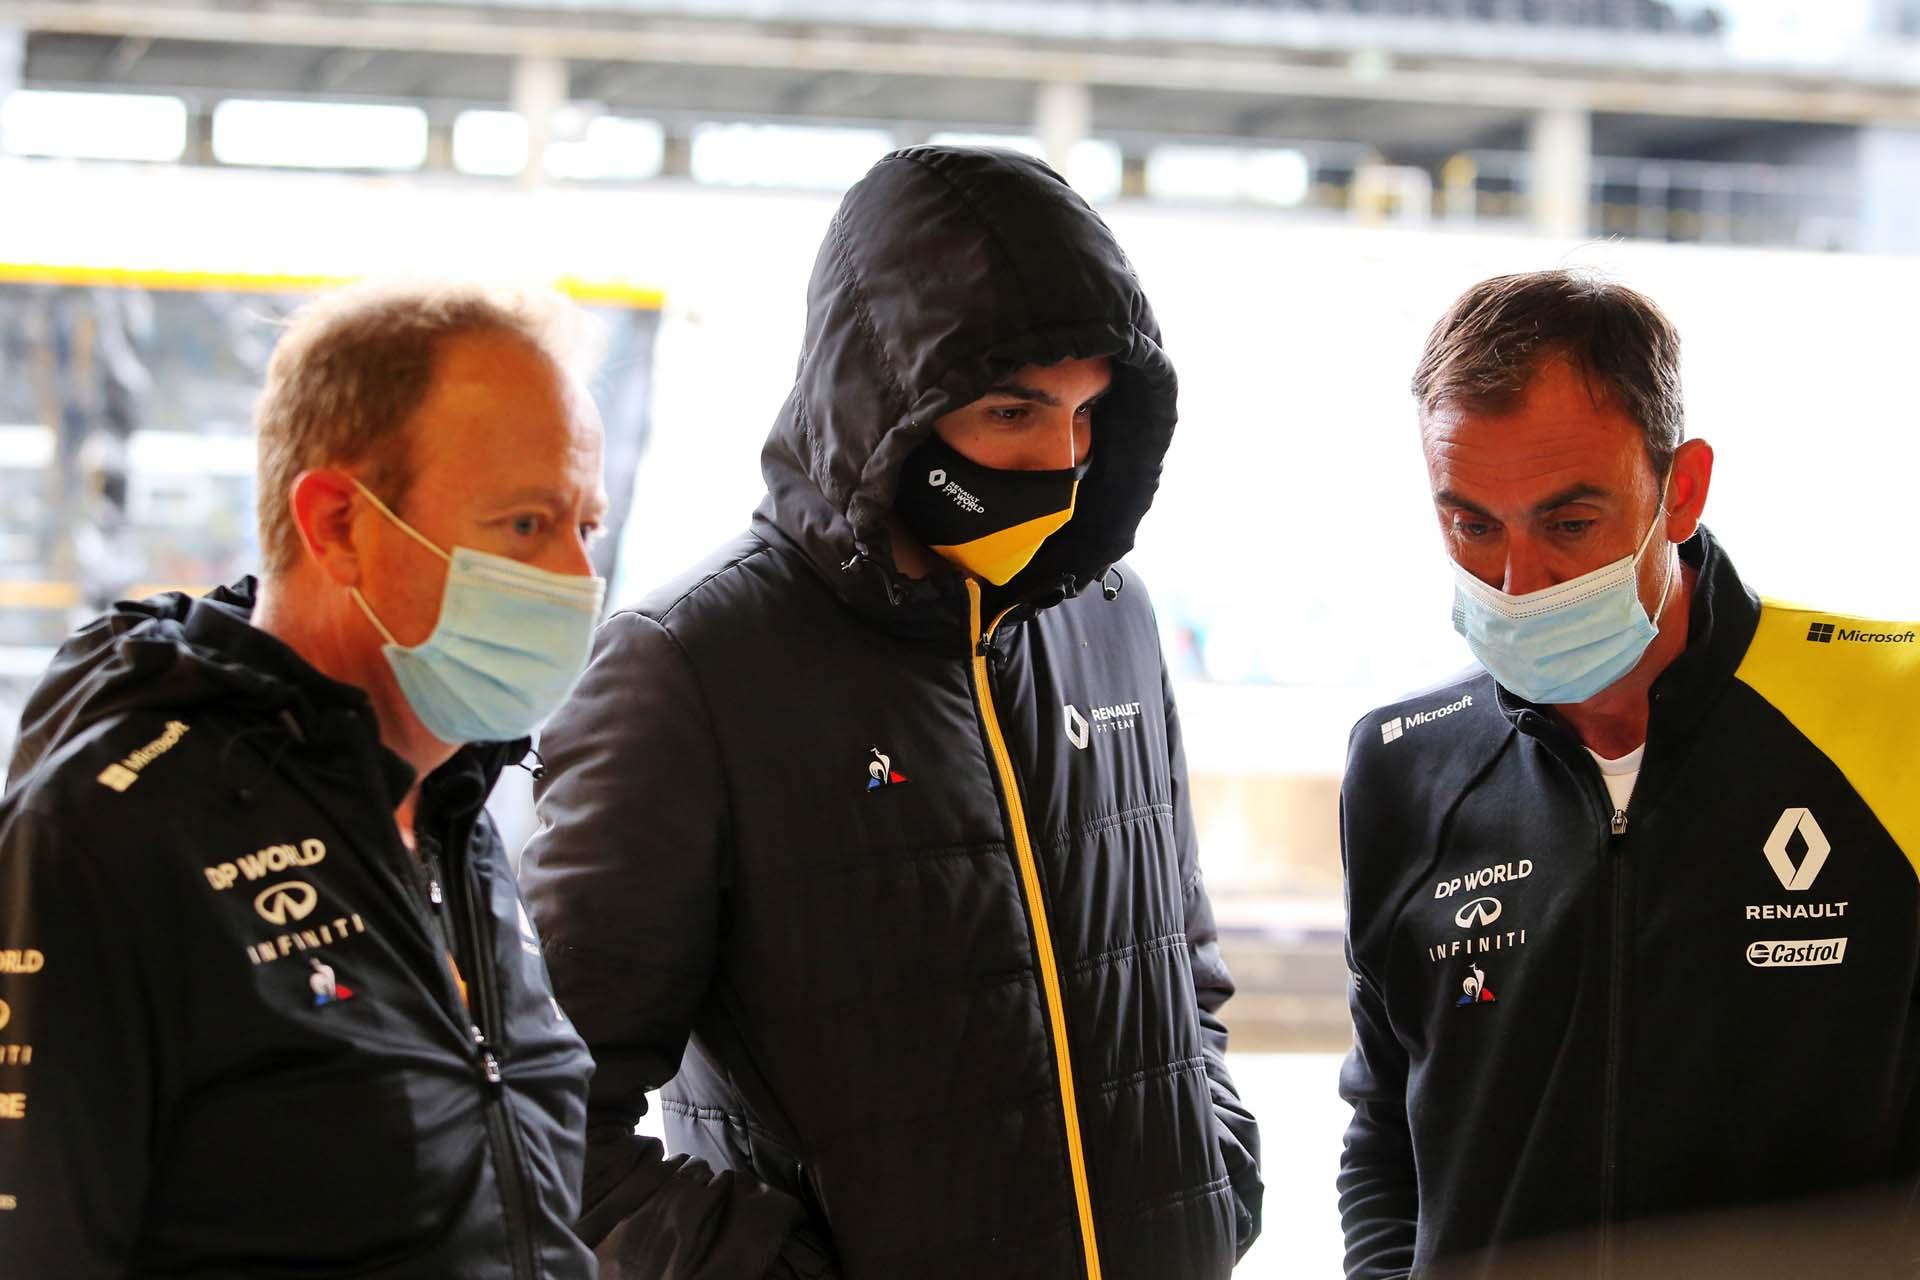 Motor Racing - Formula One World Championship - Eifel Grand Prix - Preparation Day - Nurbugring, Germany